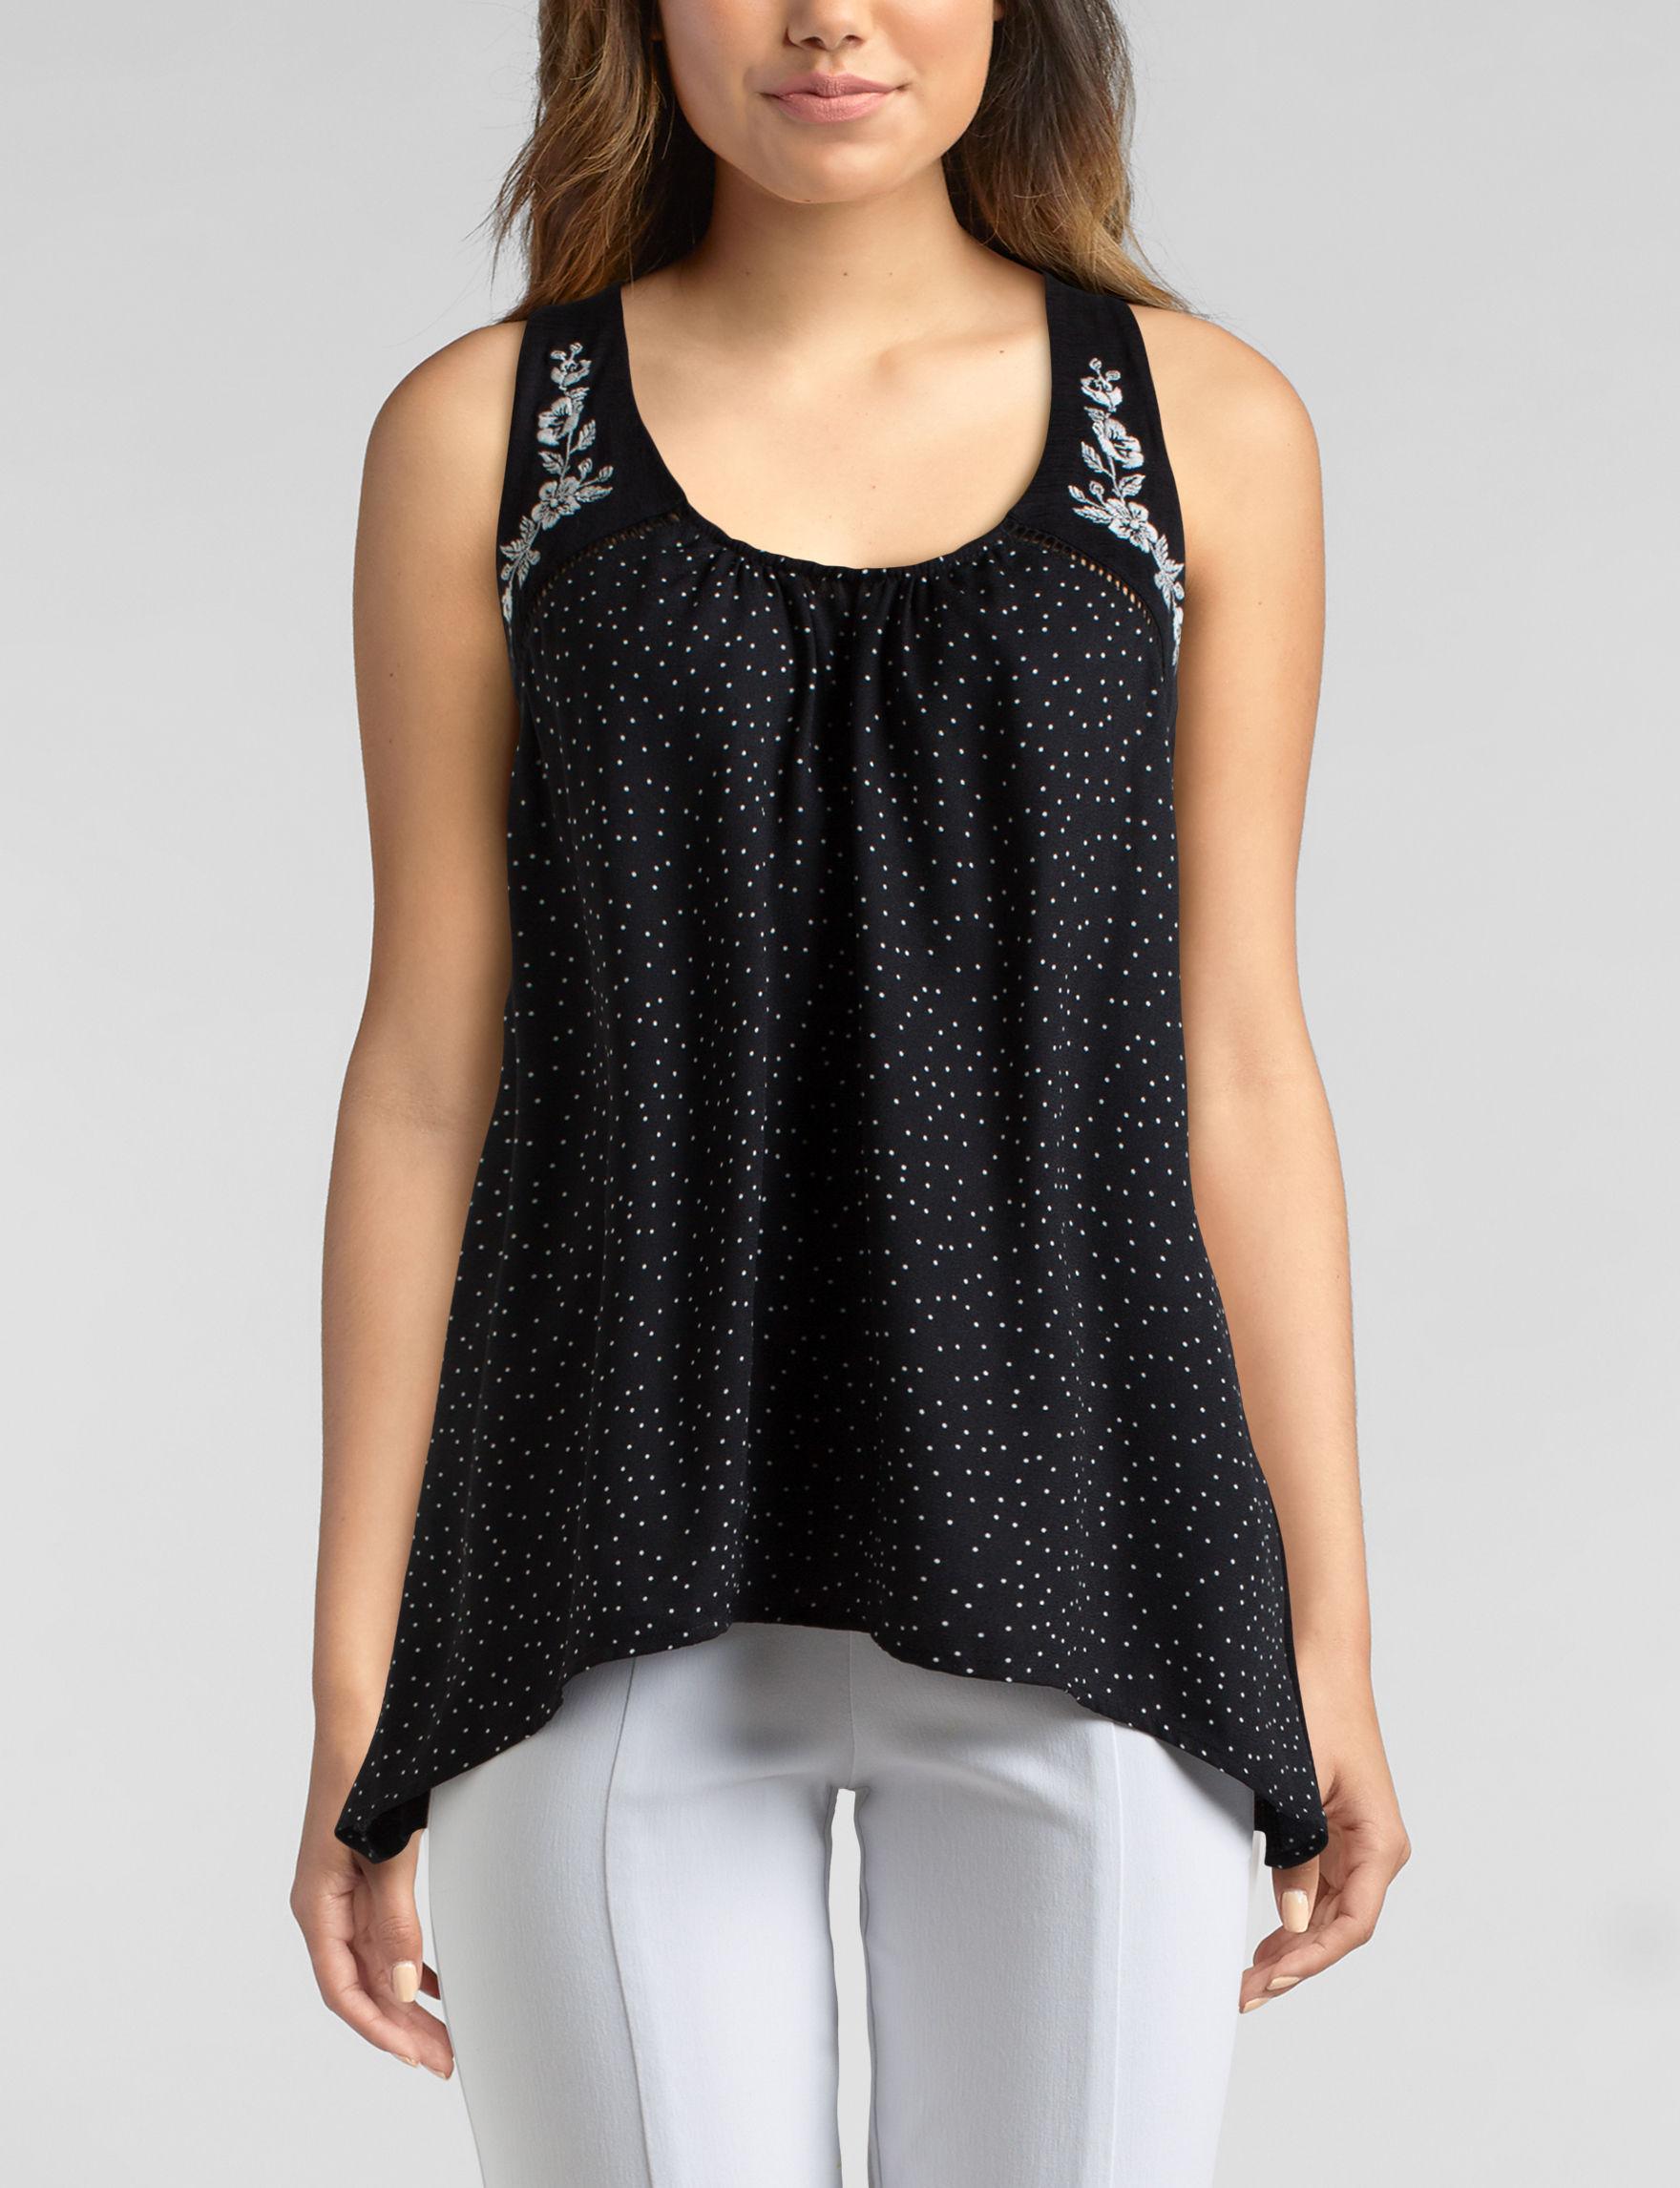 Heart Soul Black Shirts & Blouses